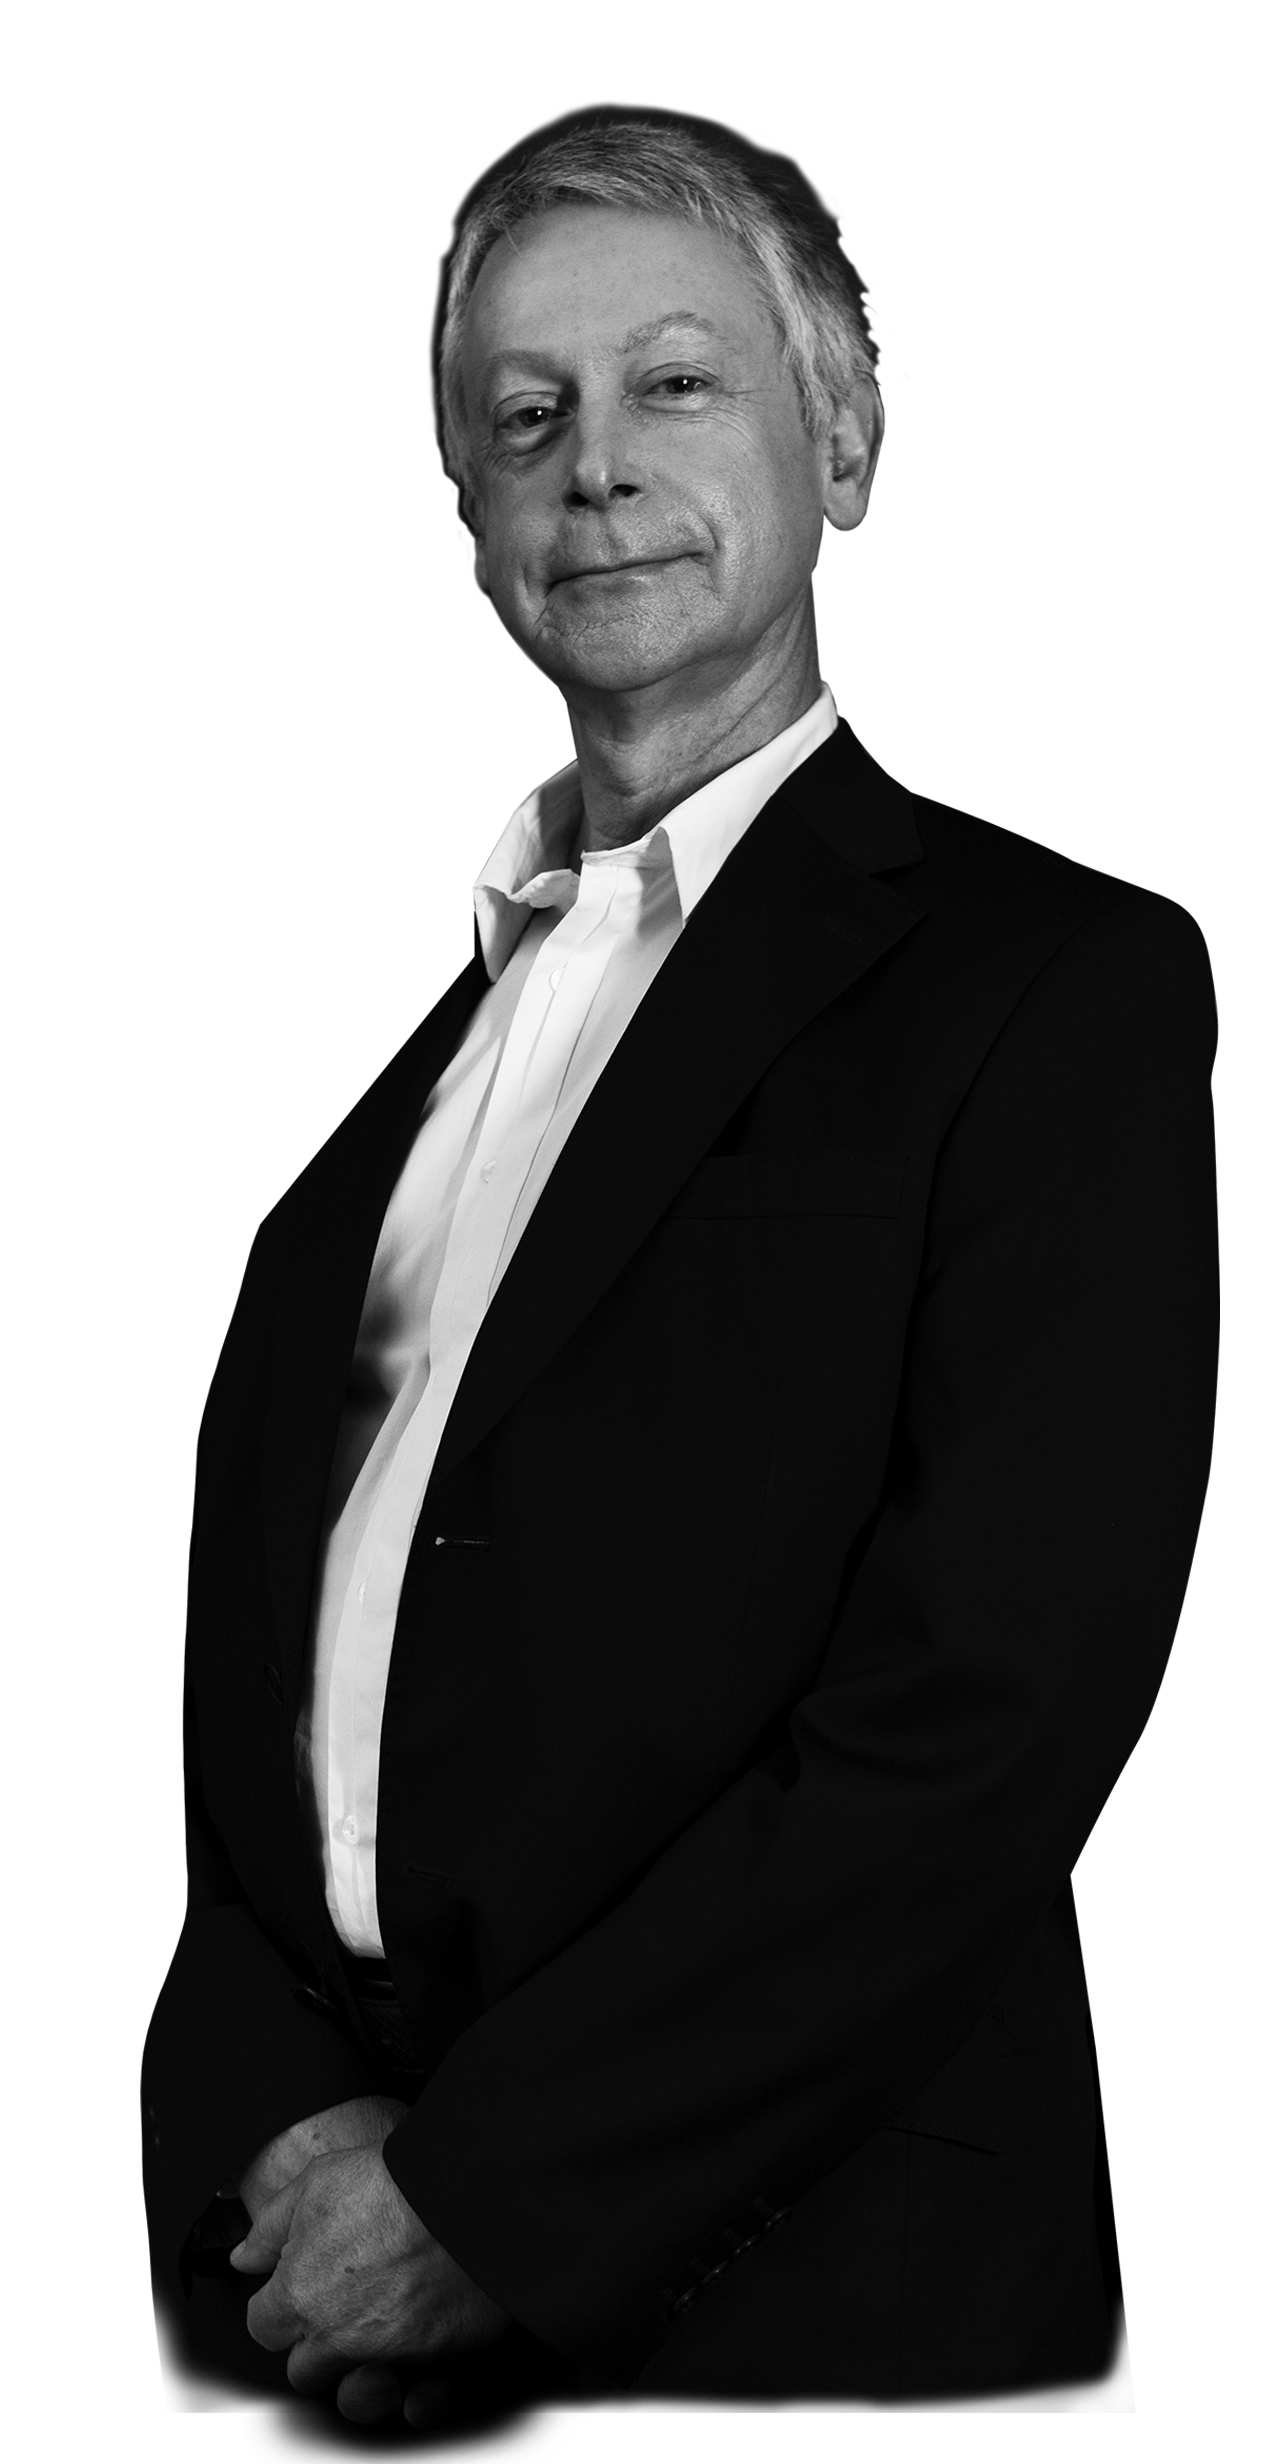 David Loxton Schindlers Forensics AI